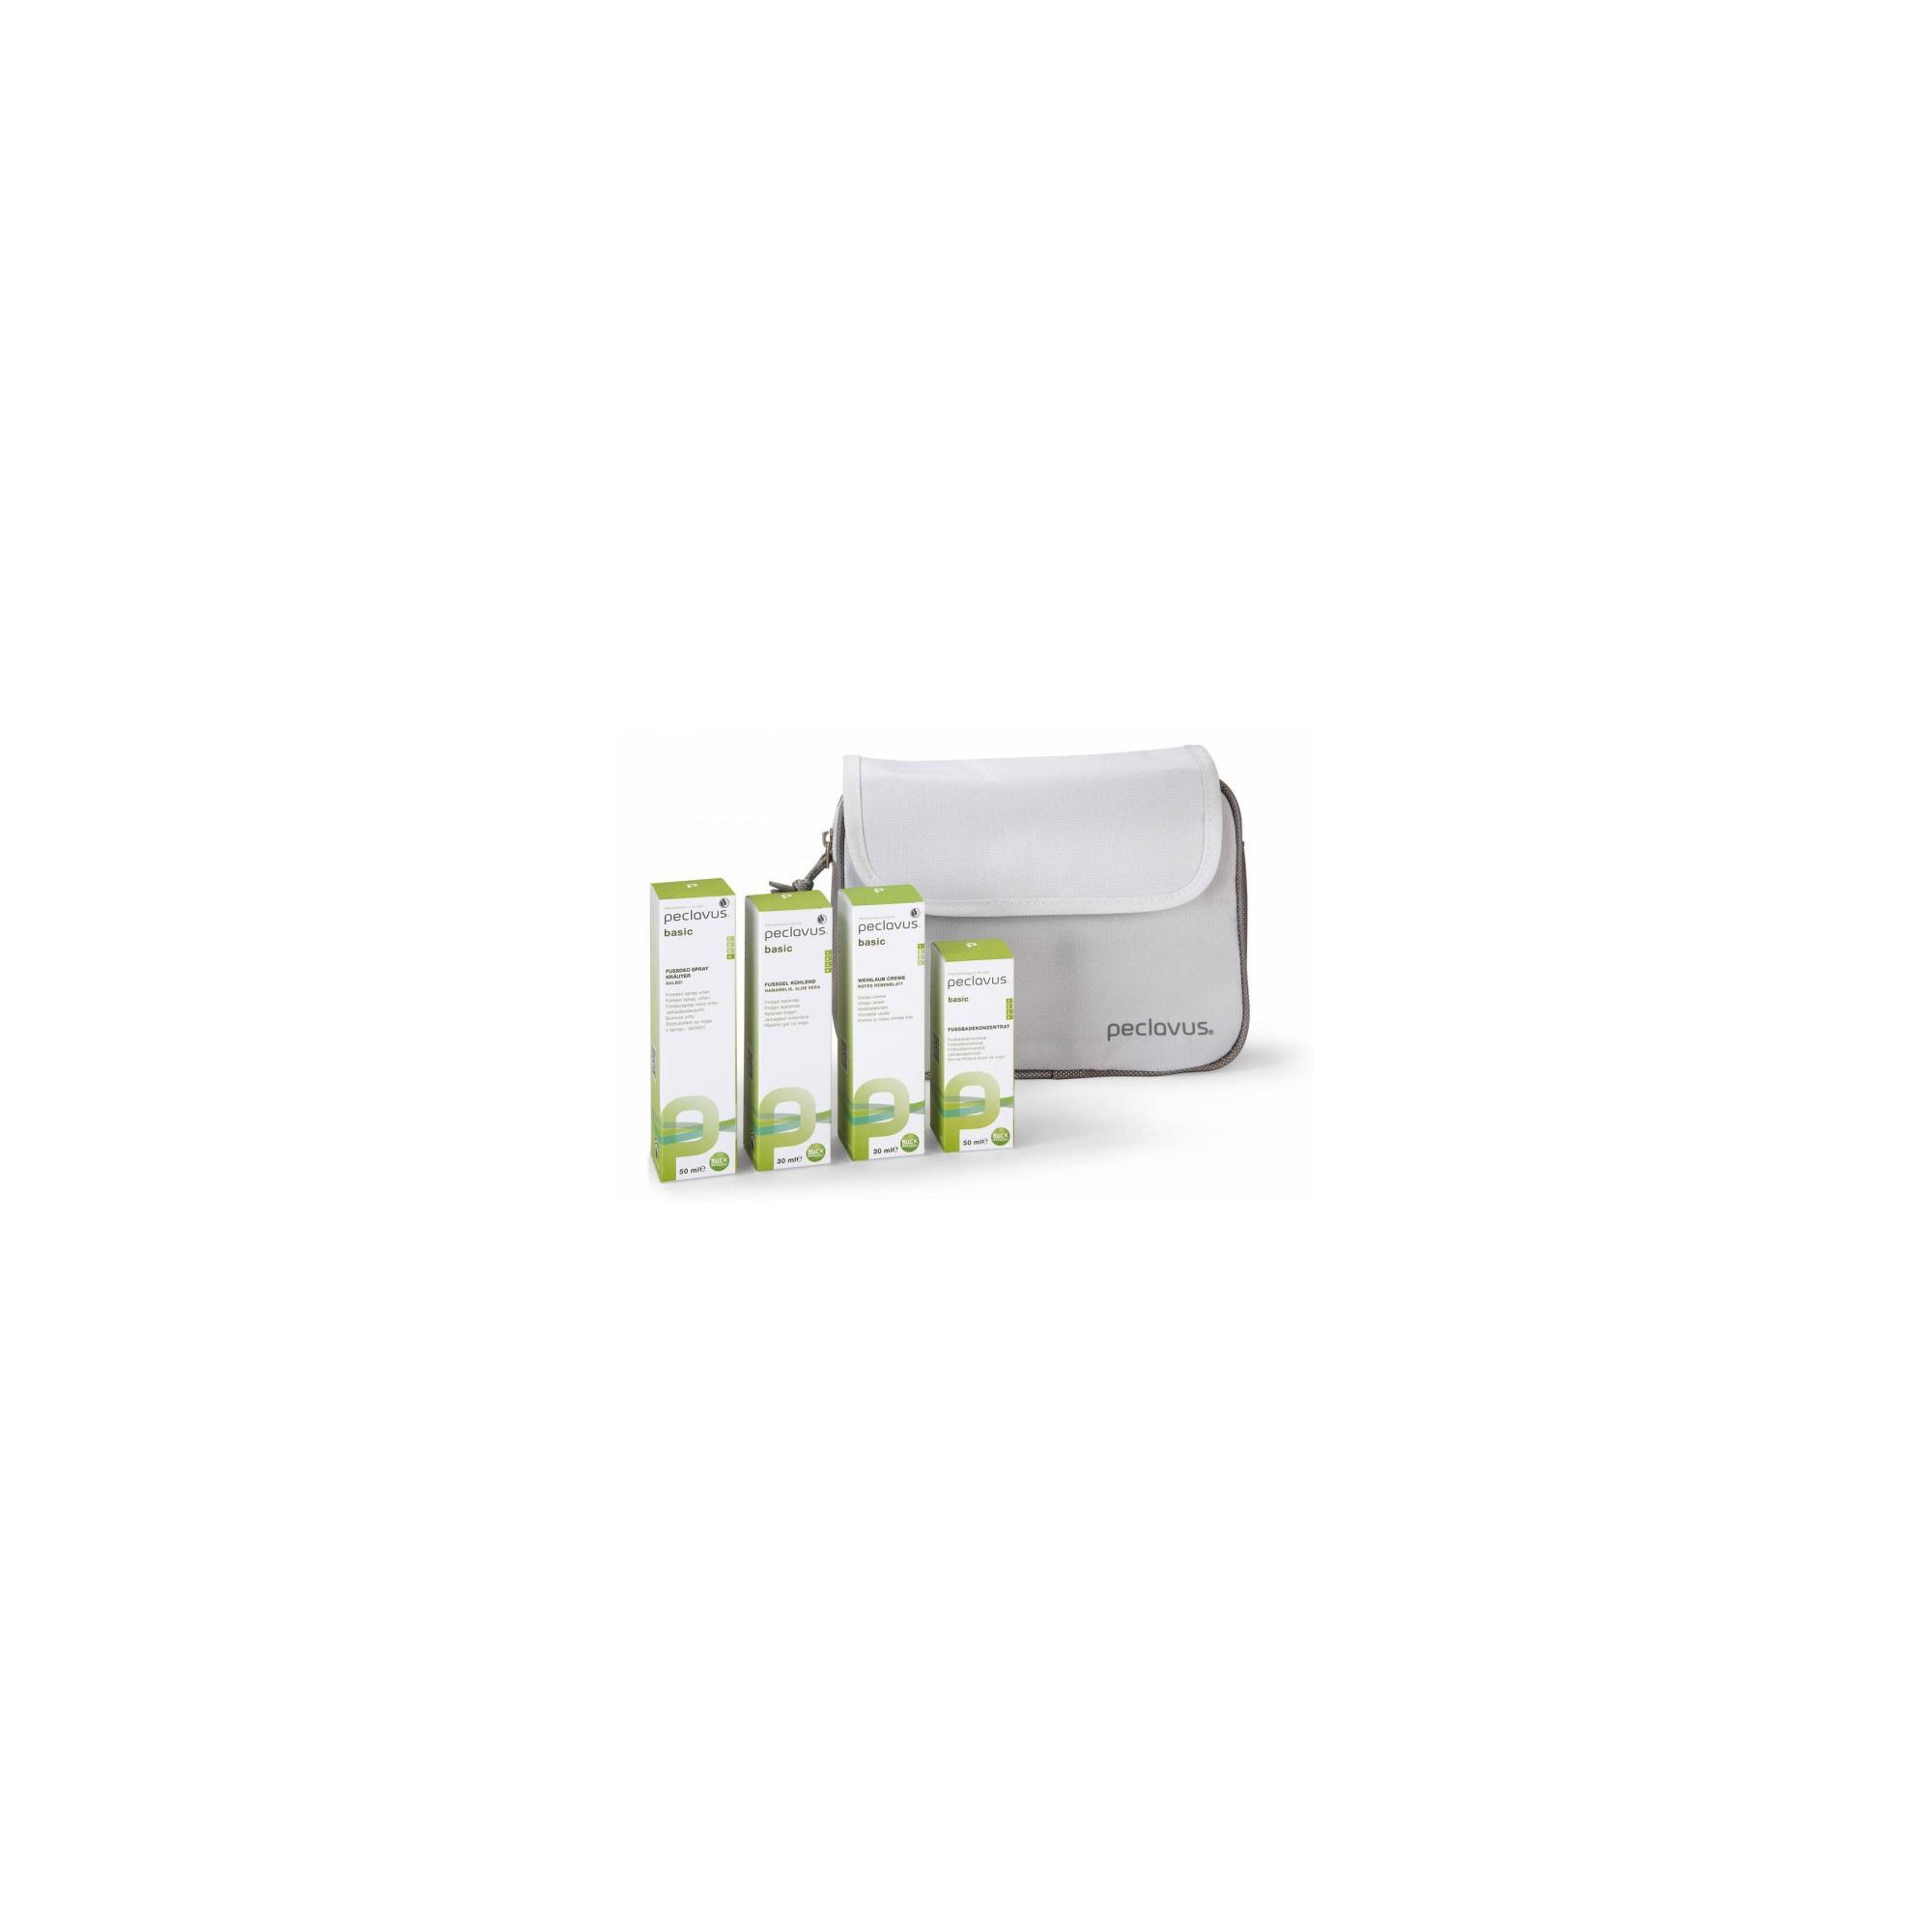 Kit Gamme Basic - 4 Soins + Pochettes - Peclavus